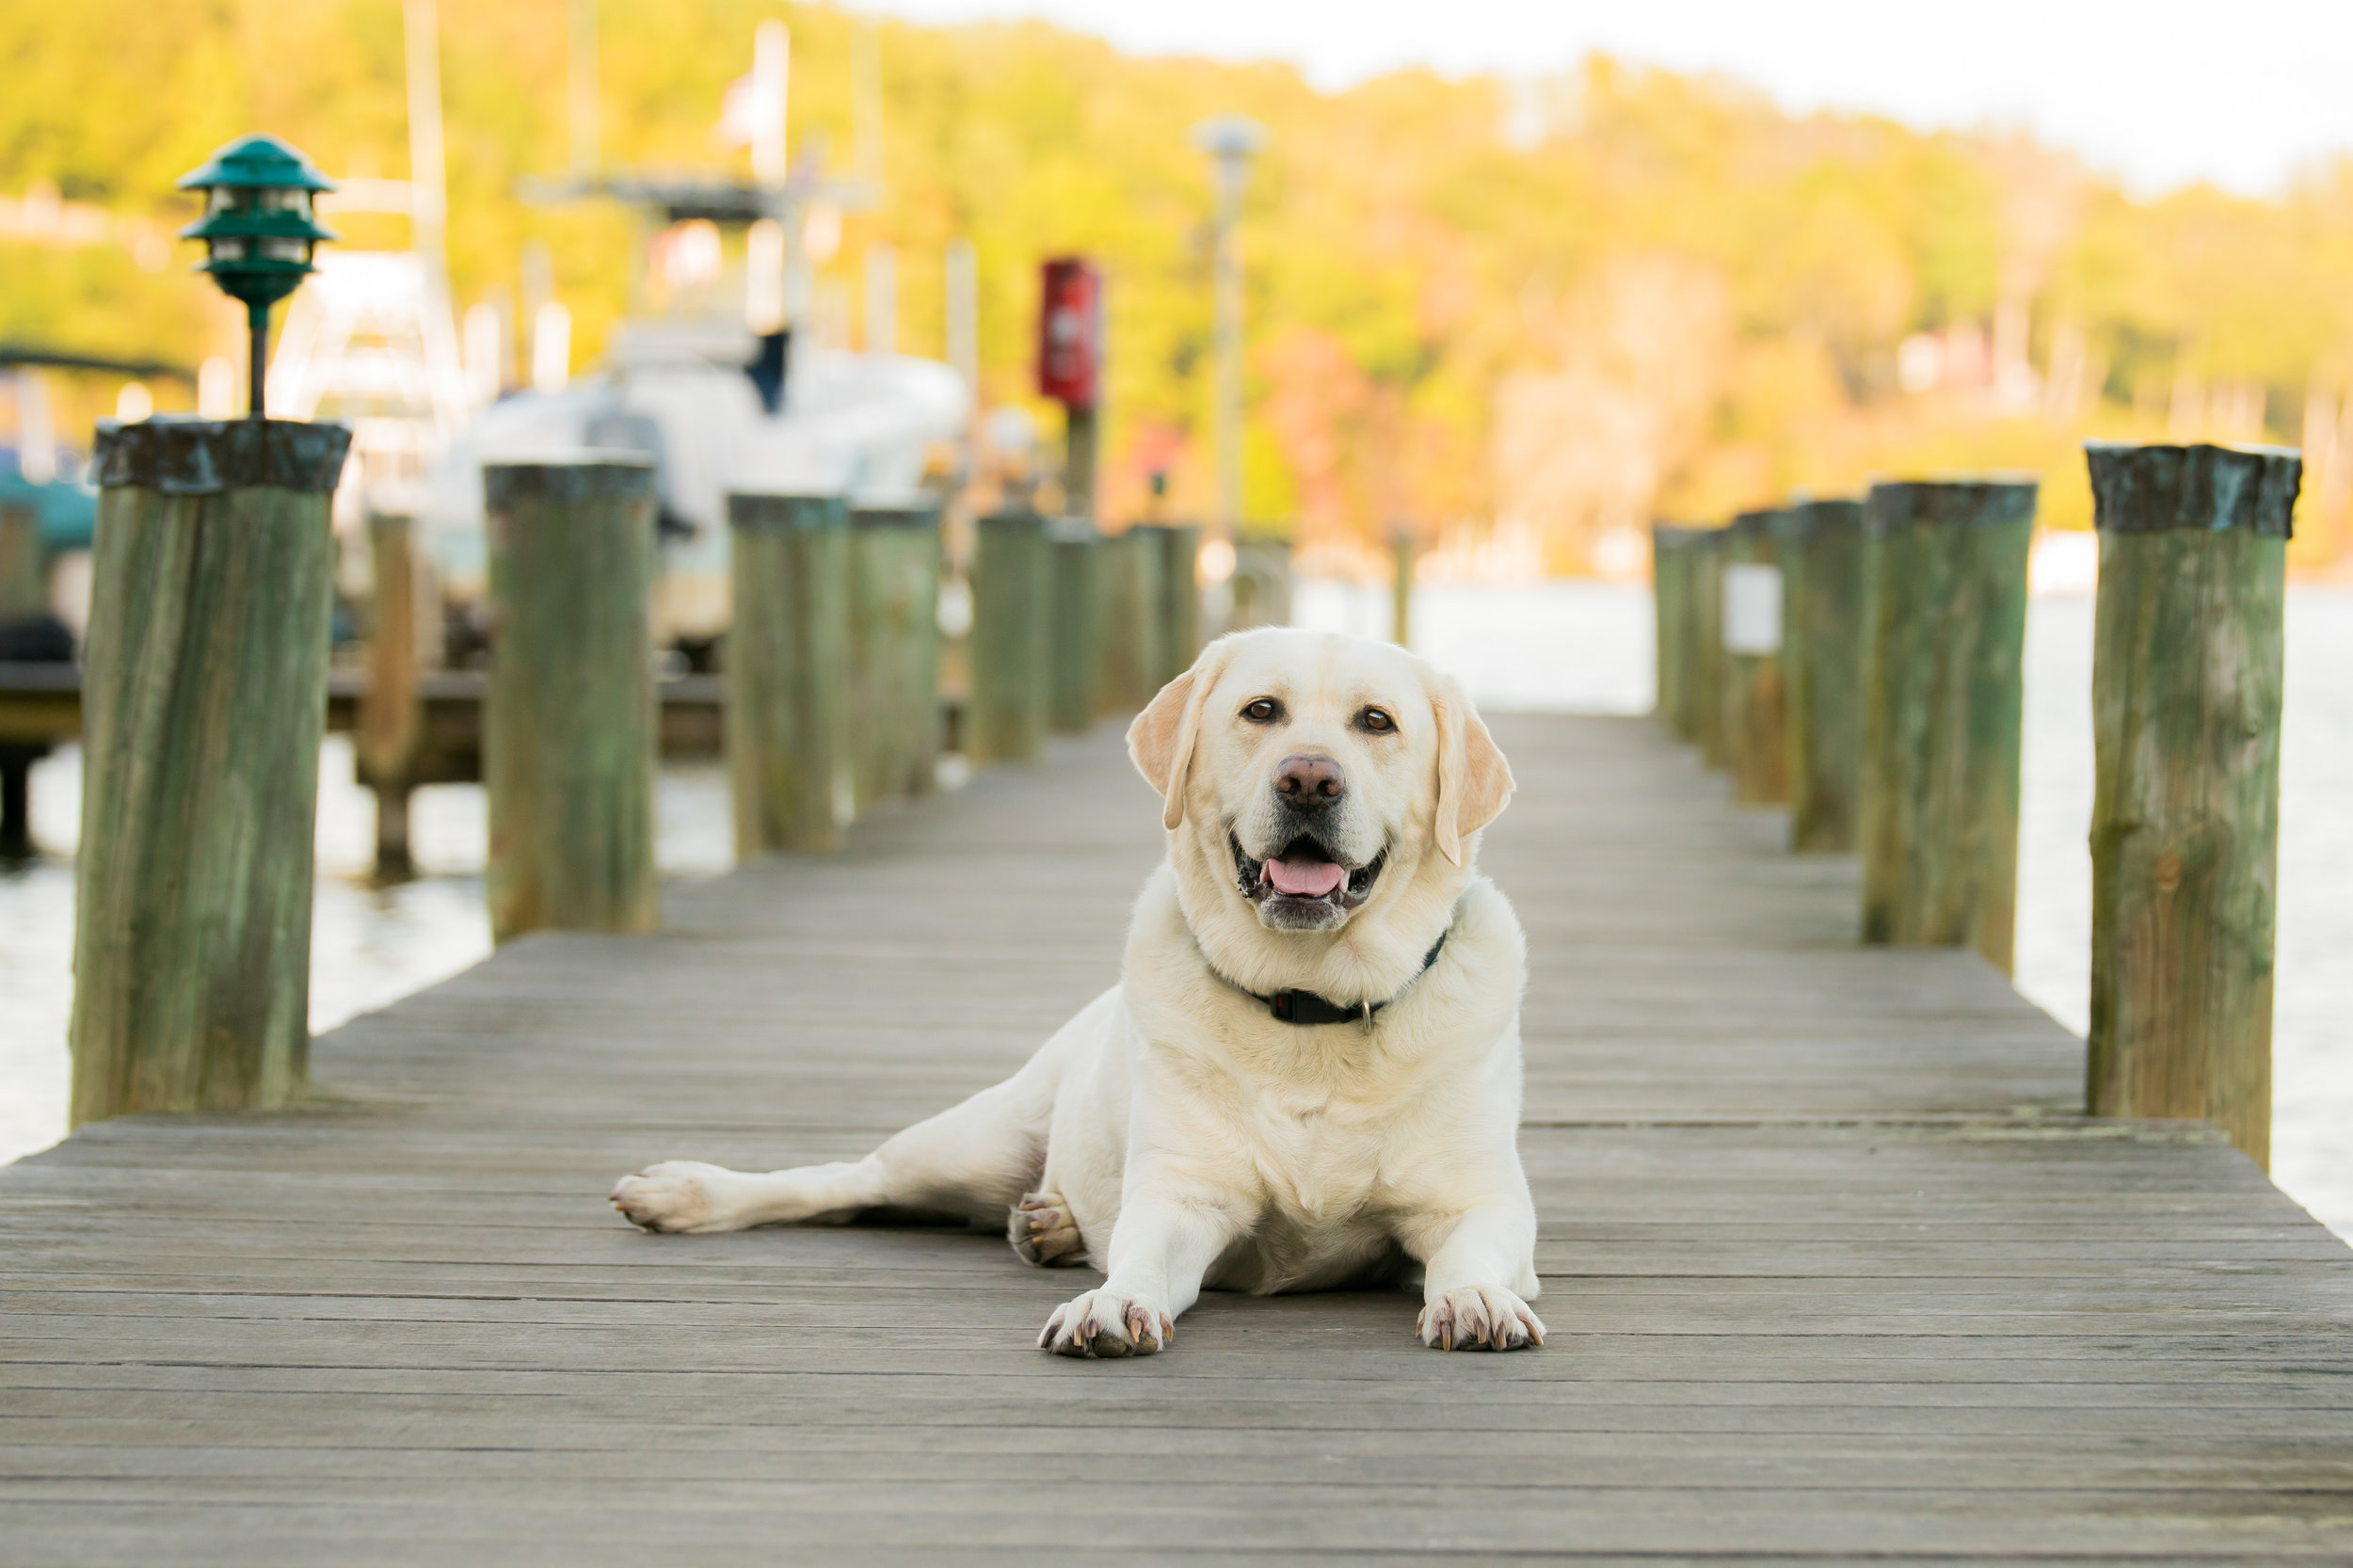 Labrador Retriever (Lab) Dog on the dock in Davidsonville Maryland